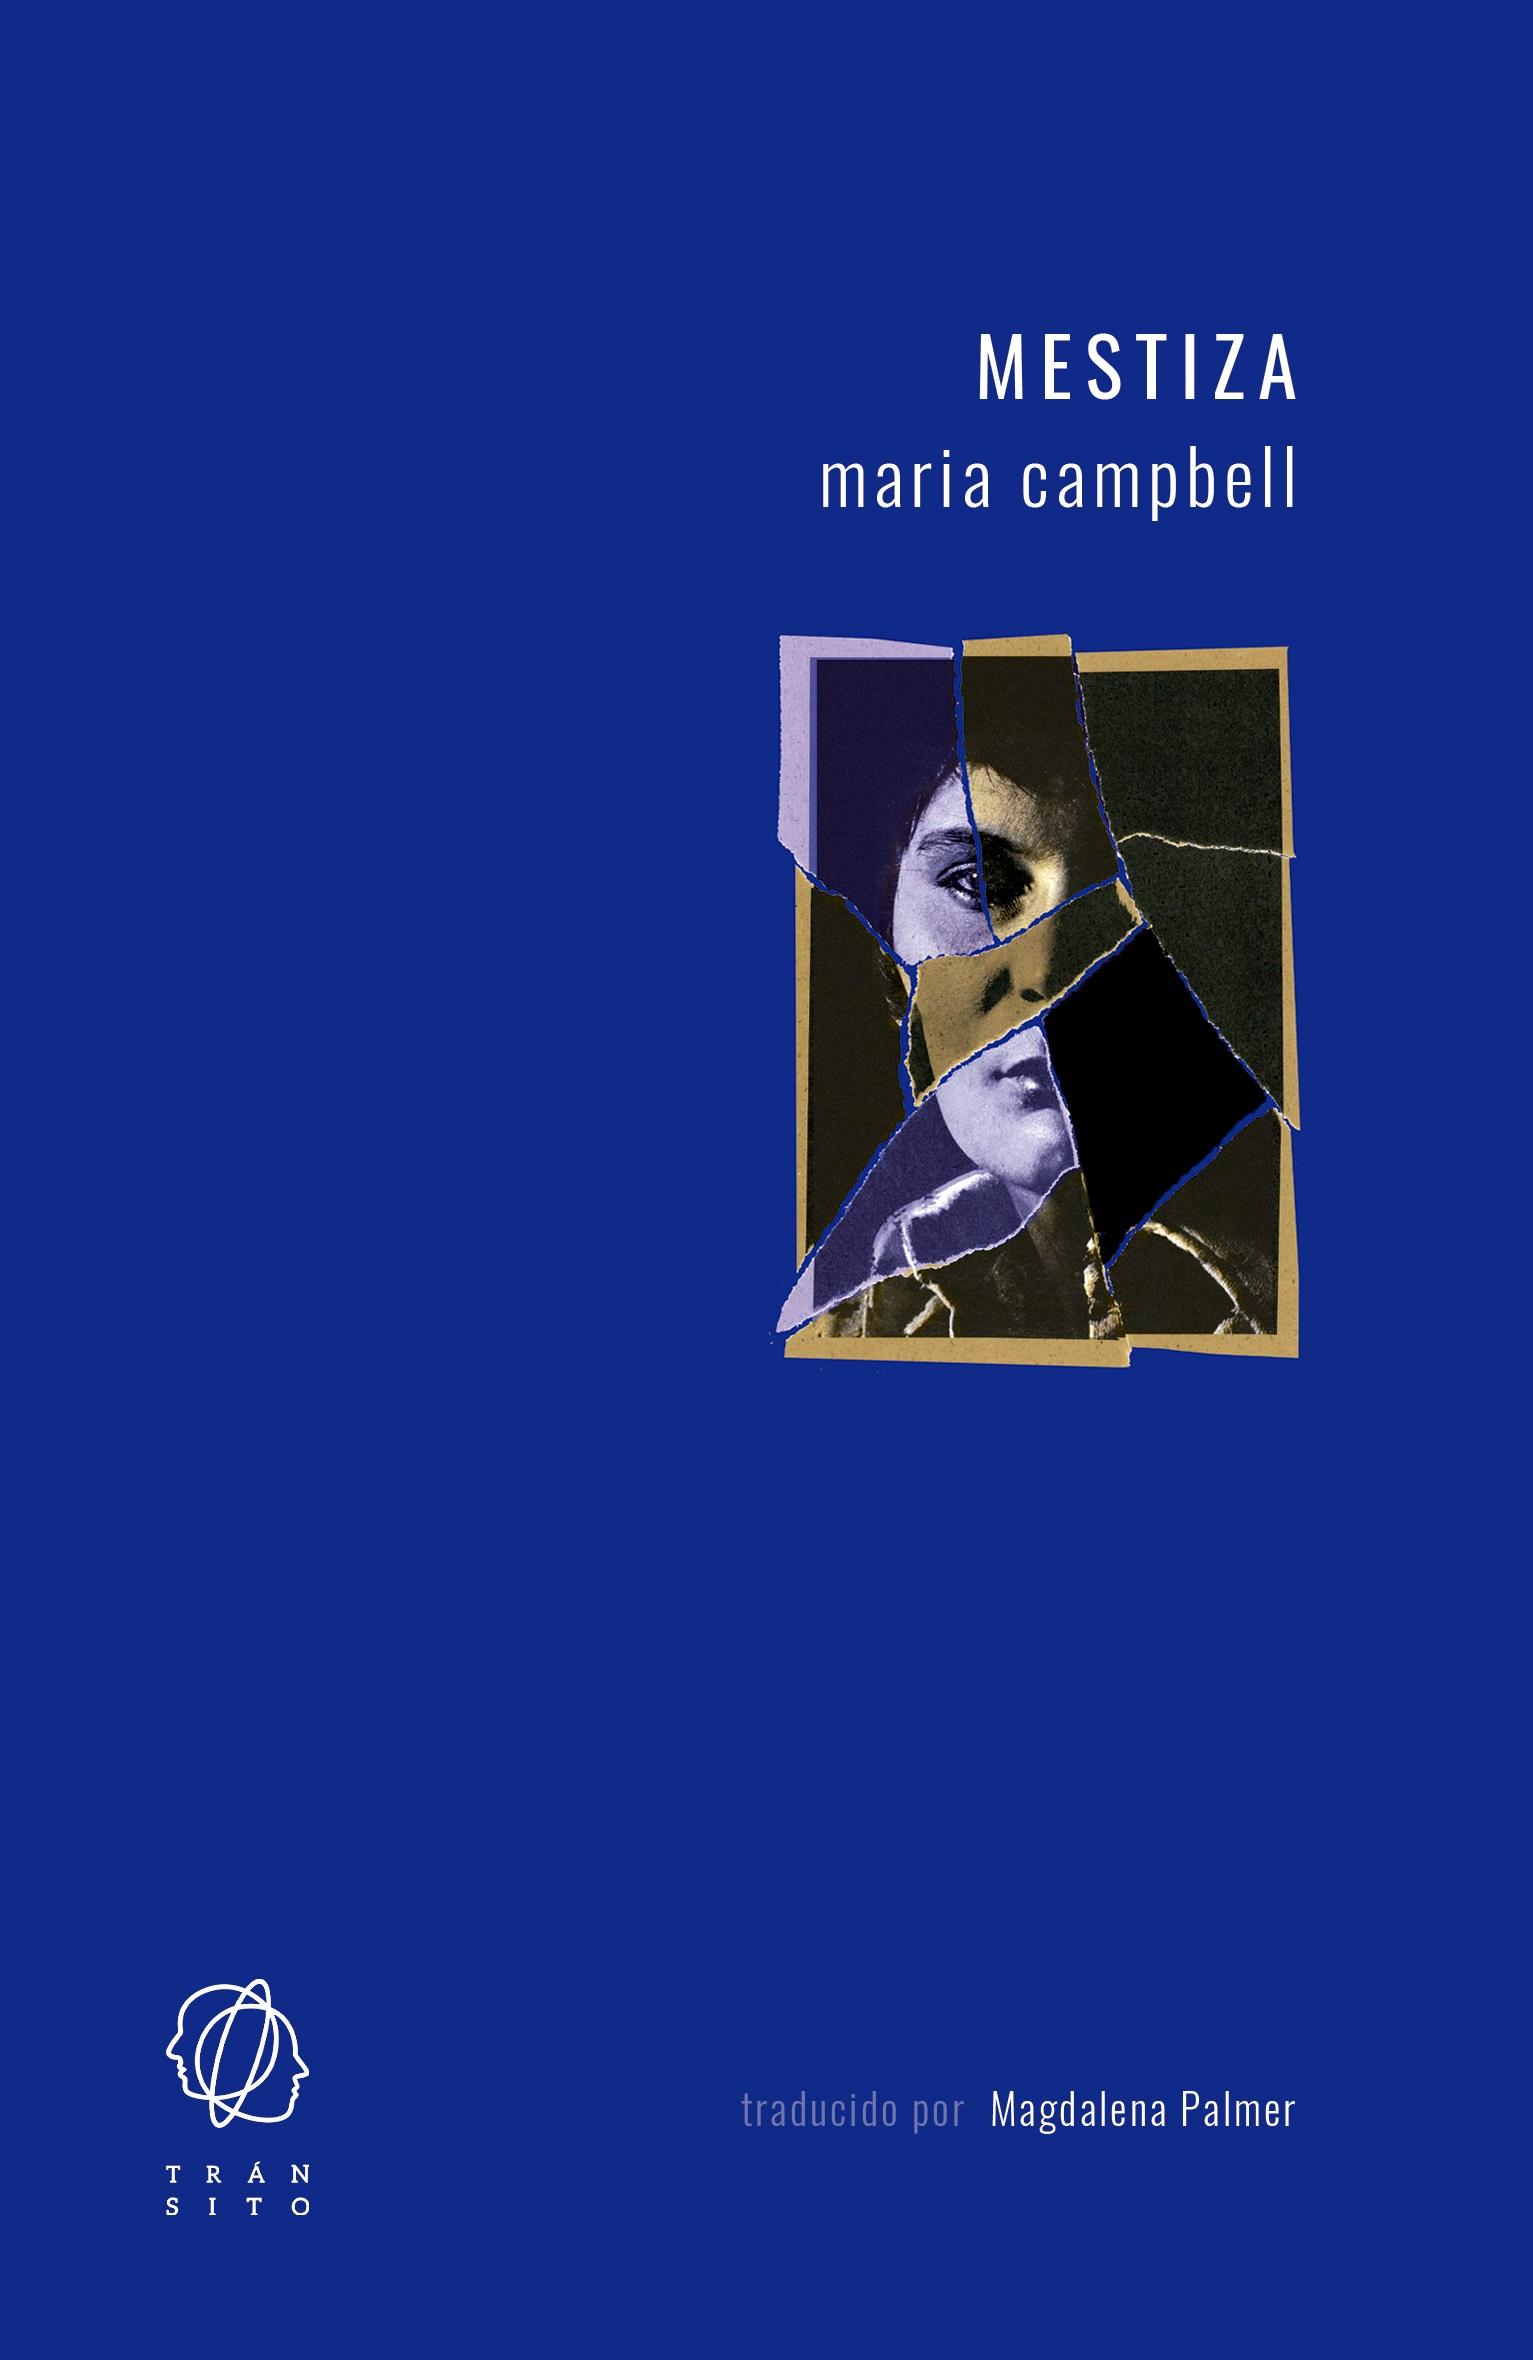 Portada del libro de memorias «Mestiza», de Maria Campbell